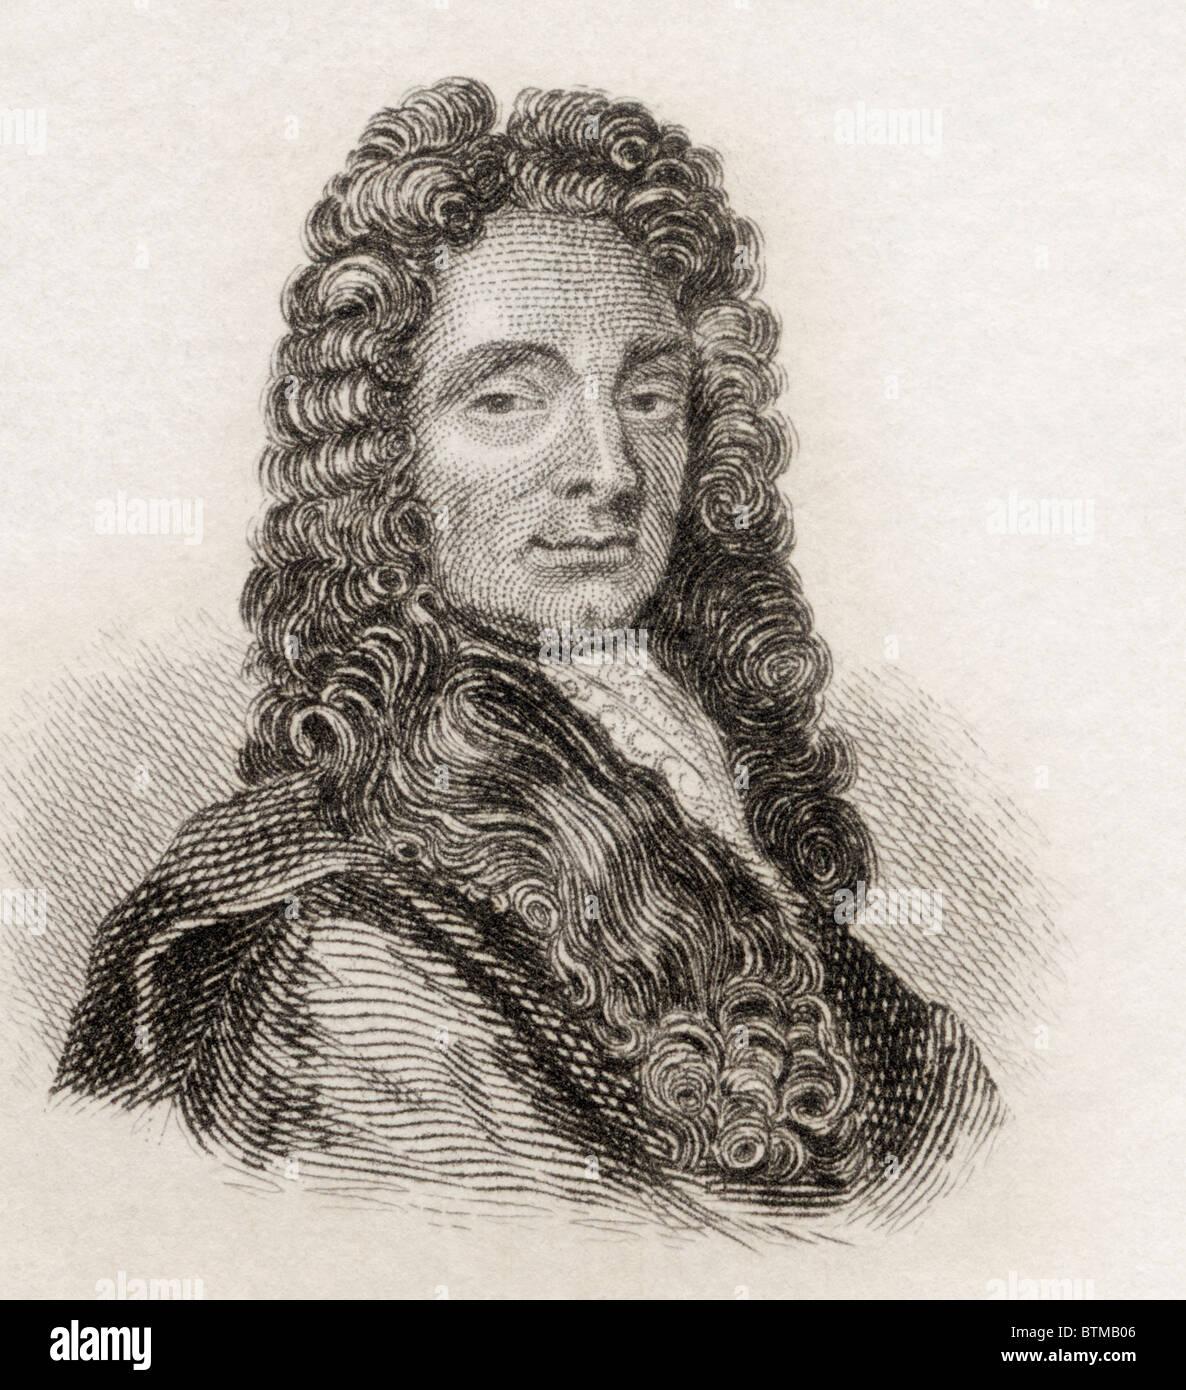 Sir Christopher Wren, 1632 to 1723. English architect. - Stock Image